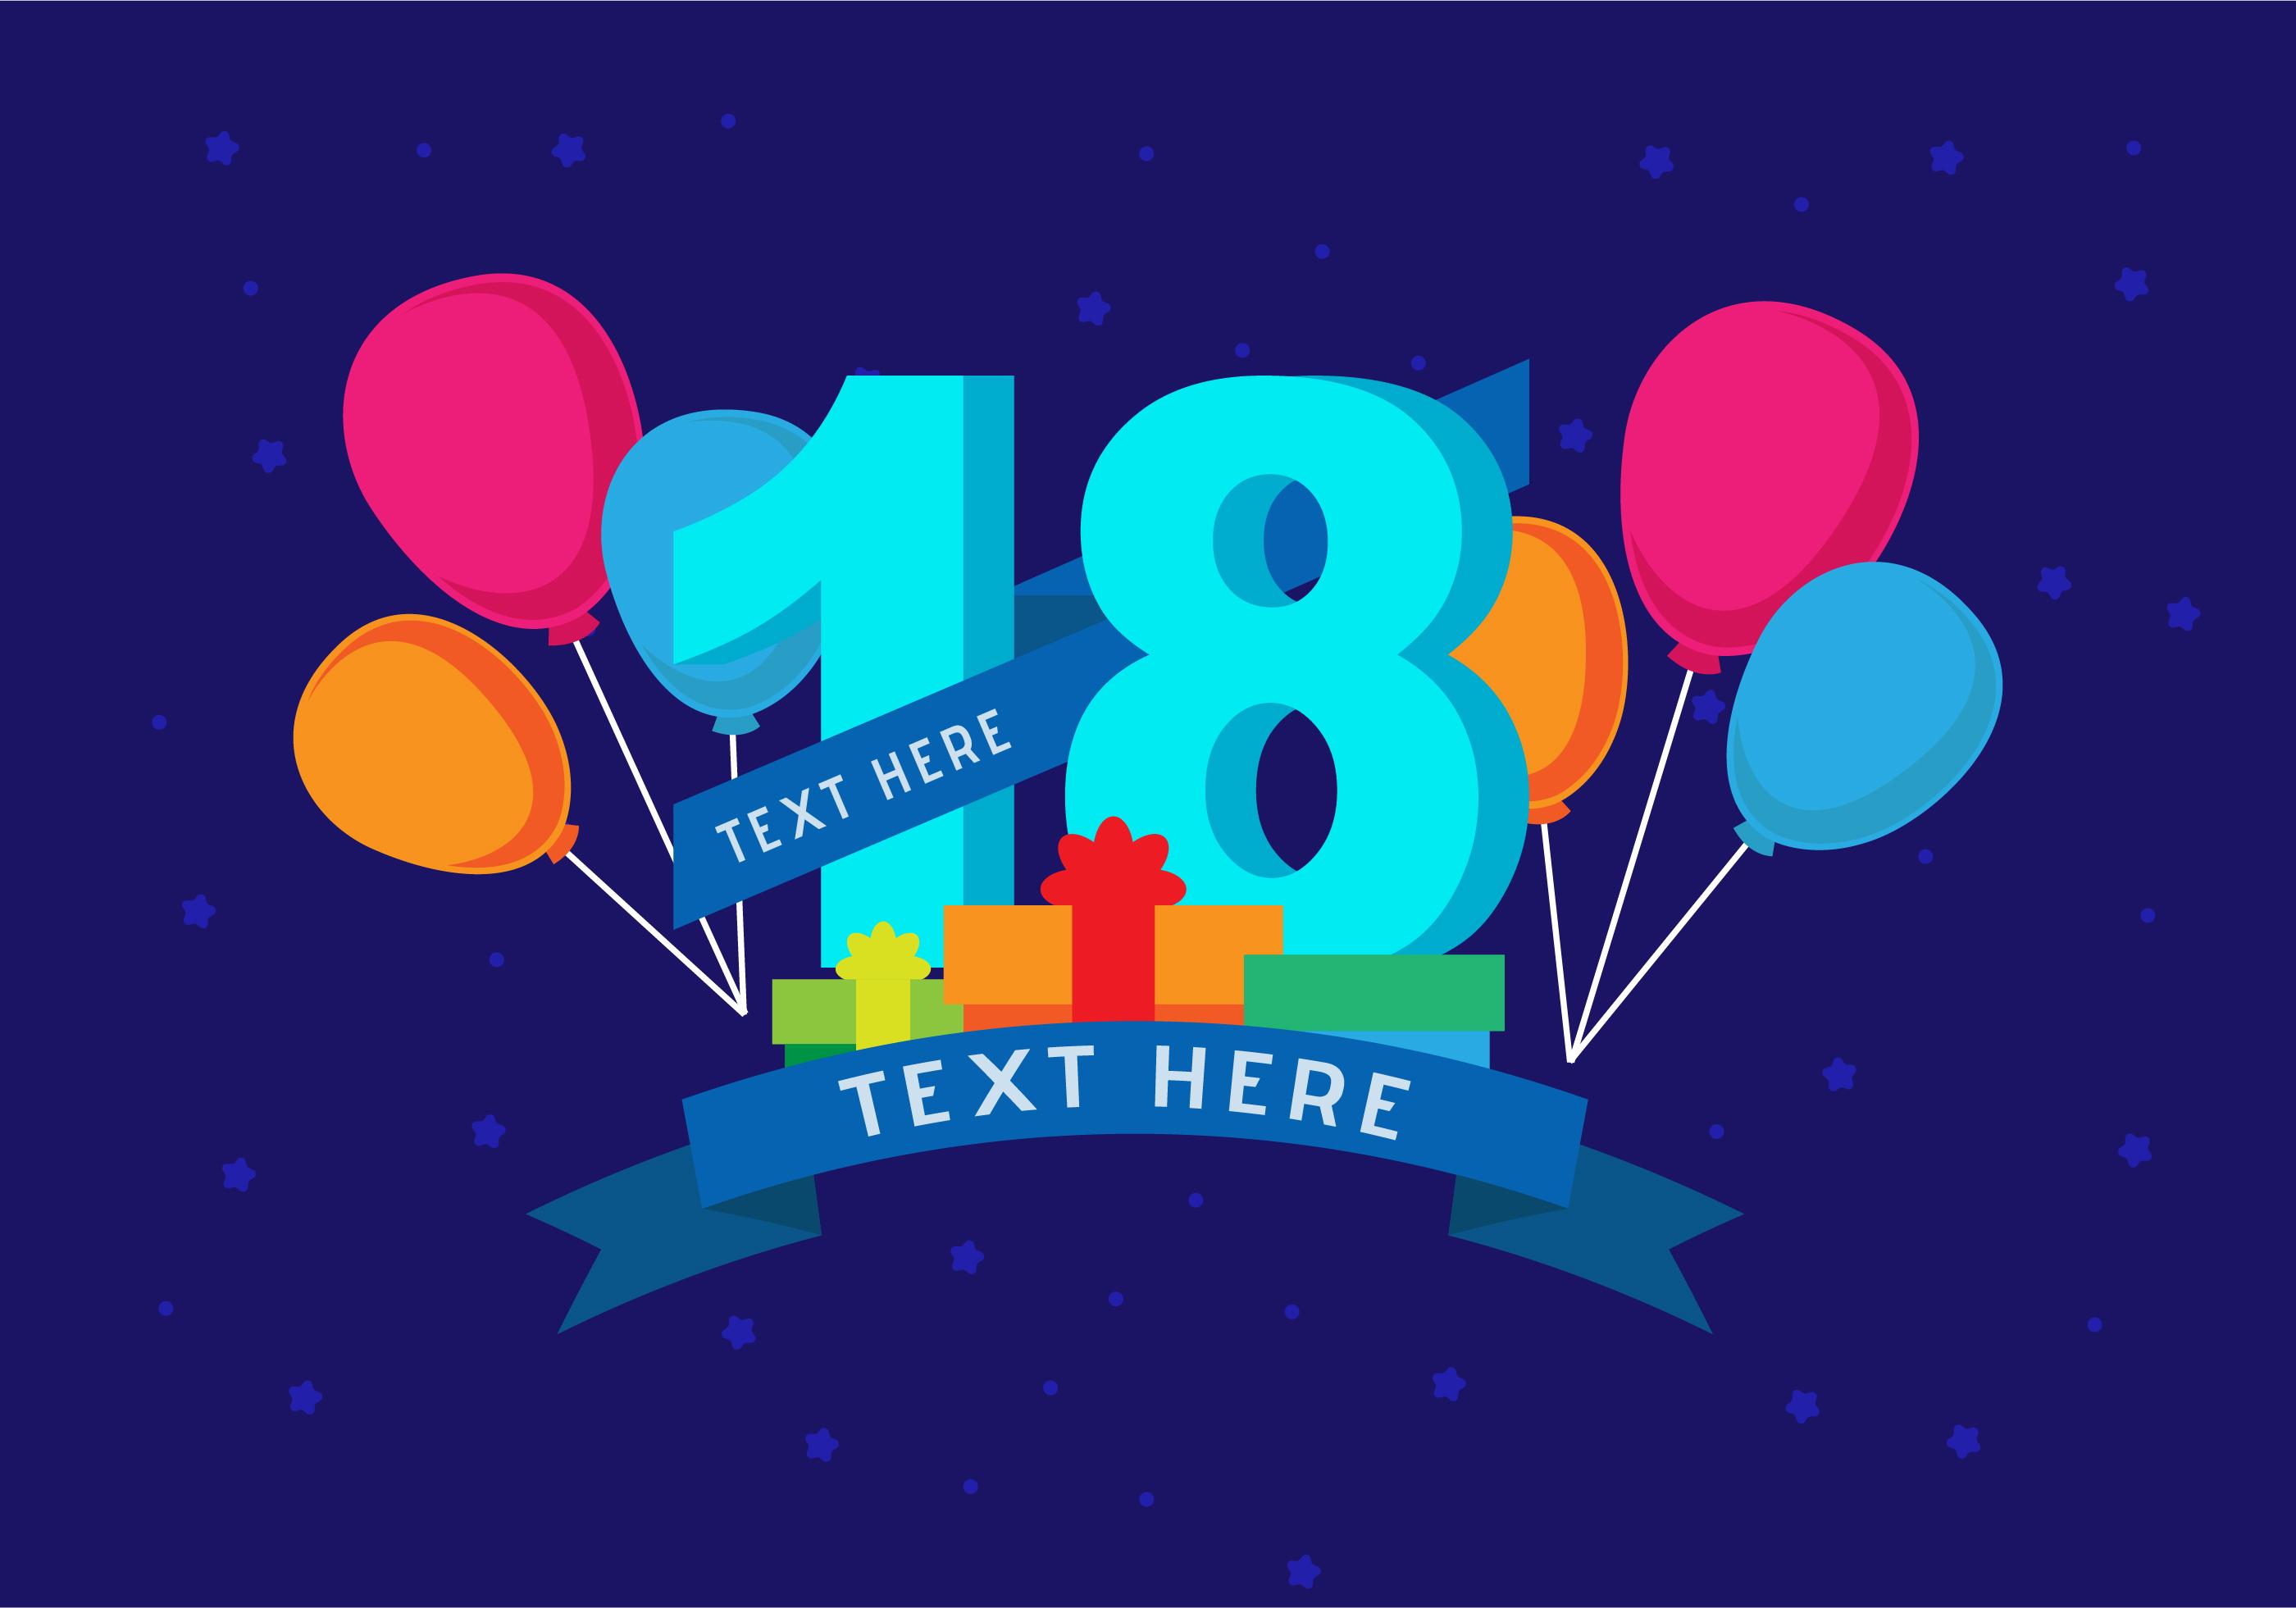 18th birthday background 174011